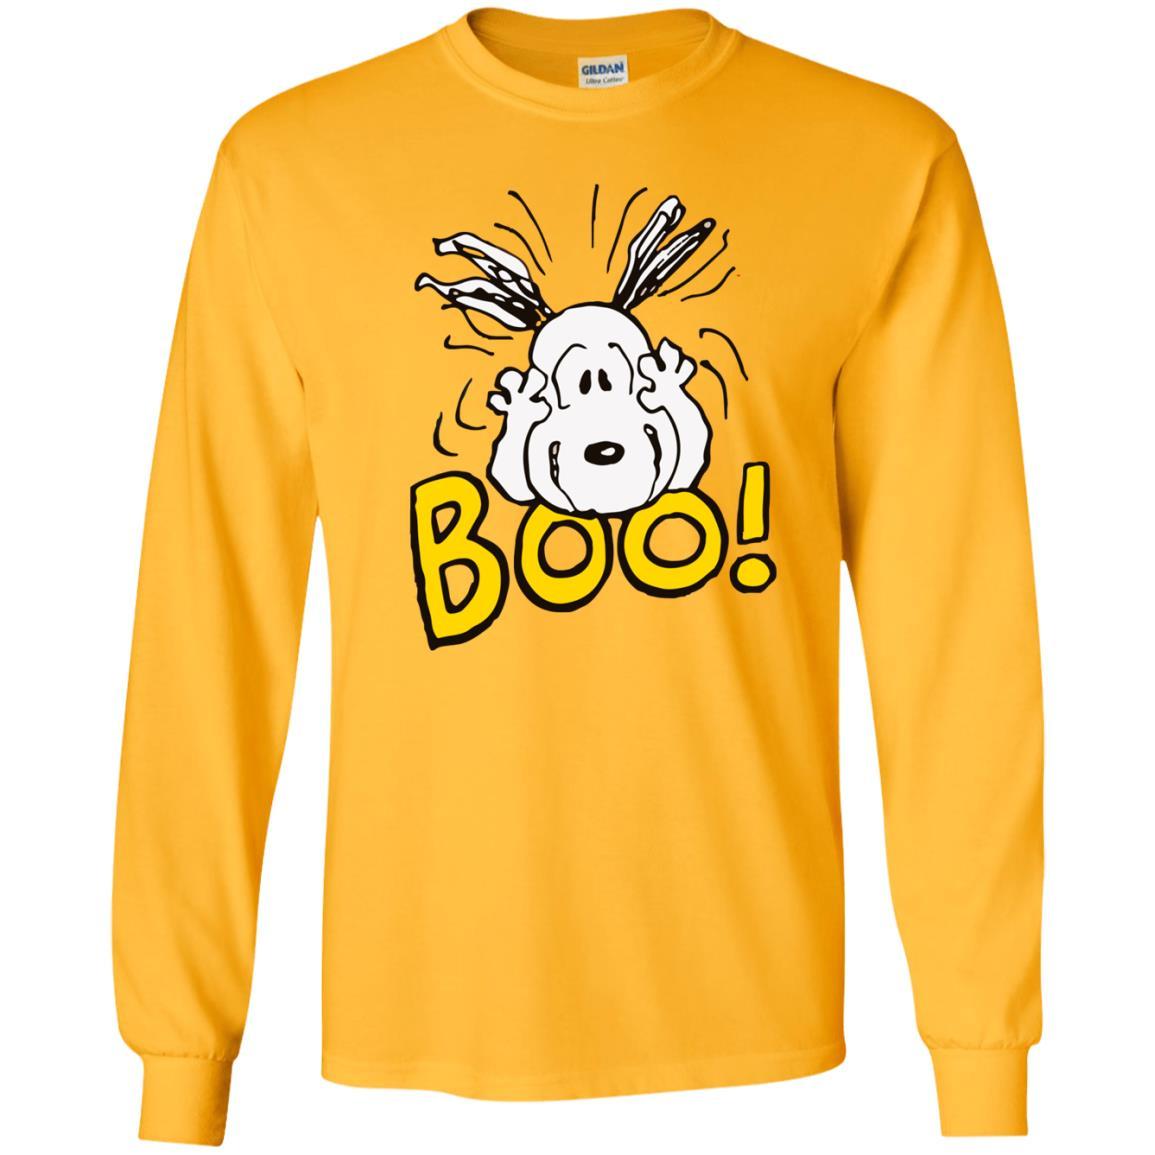 image 2230 - Peanuts Snoopy Halloween Boo shirt, hoodie, tank